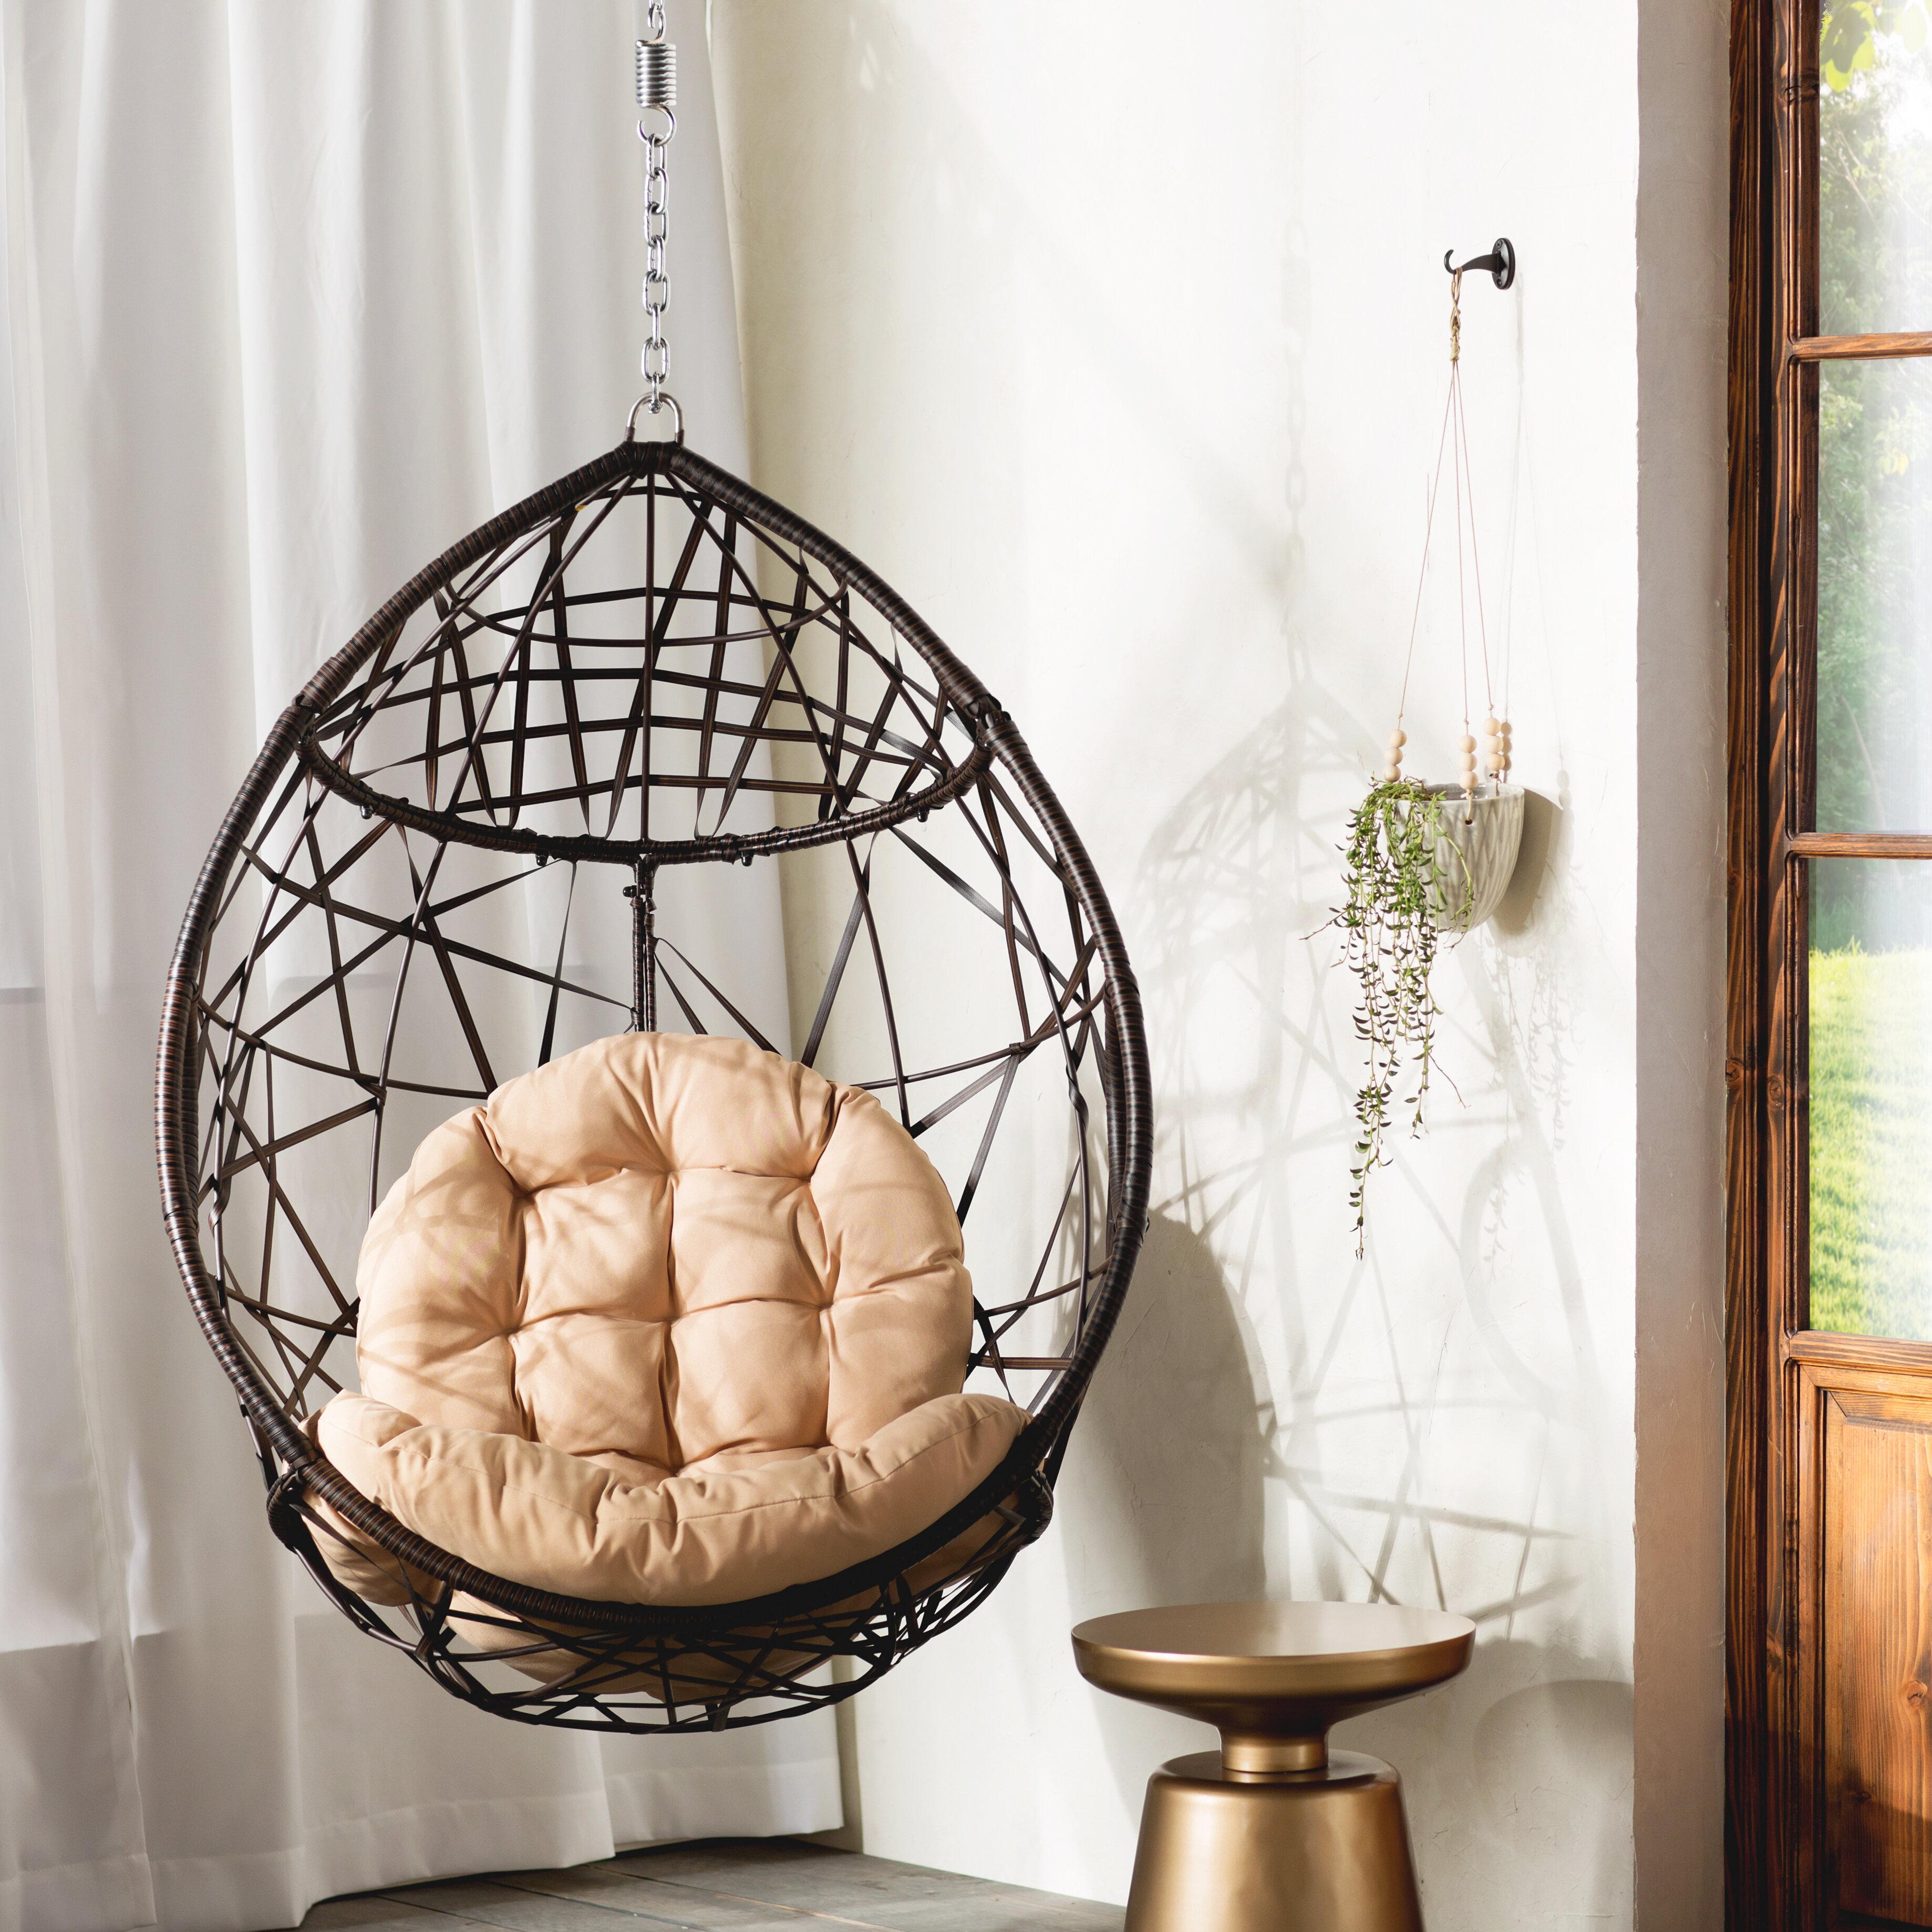 & Mistana Destiny Tear Drop Swing Chair with Stand u0026 Reviews | Wayfair